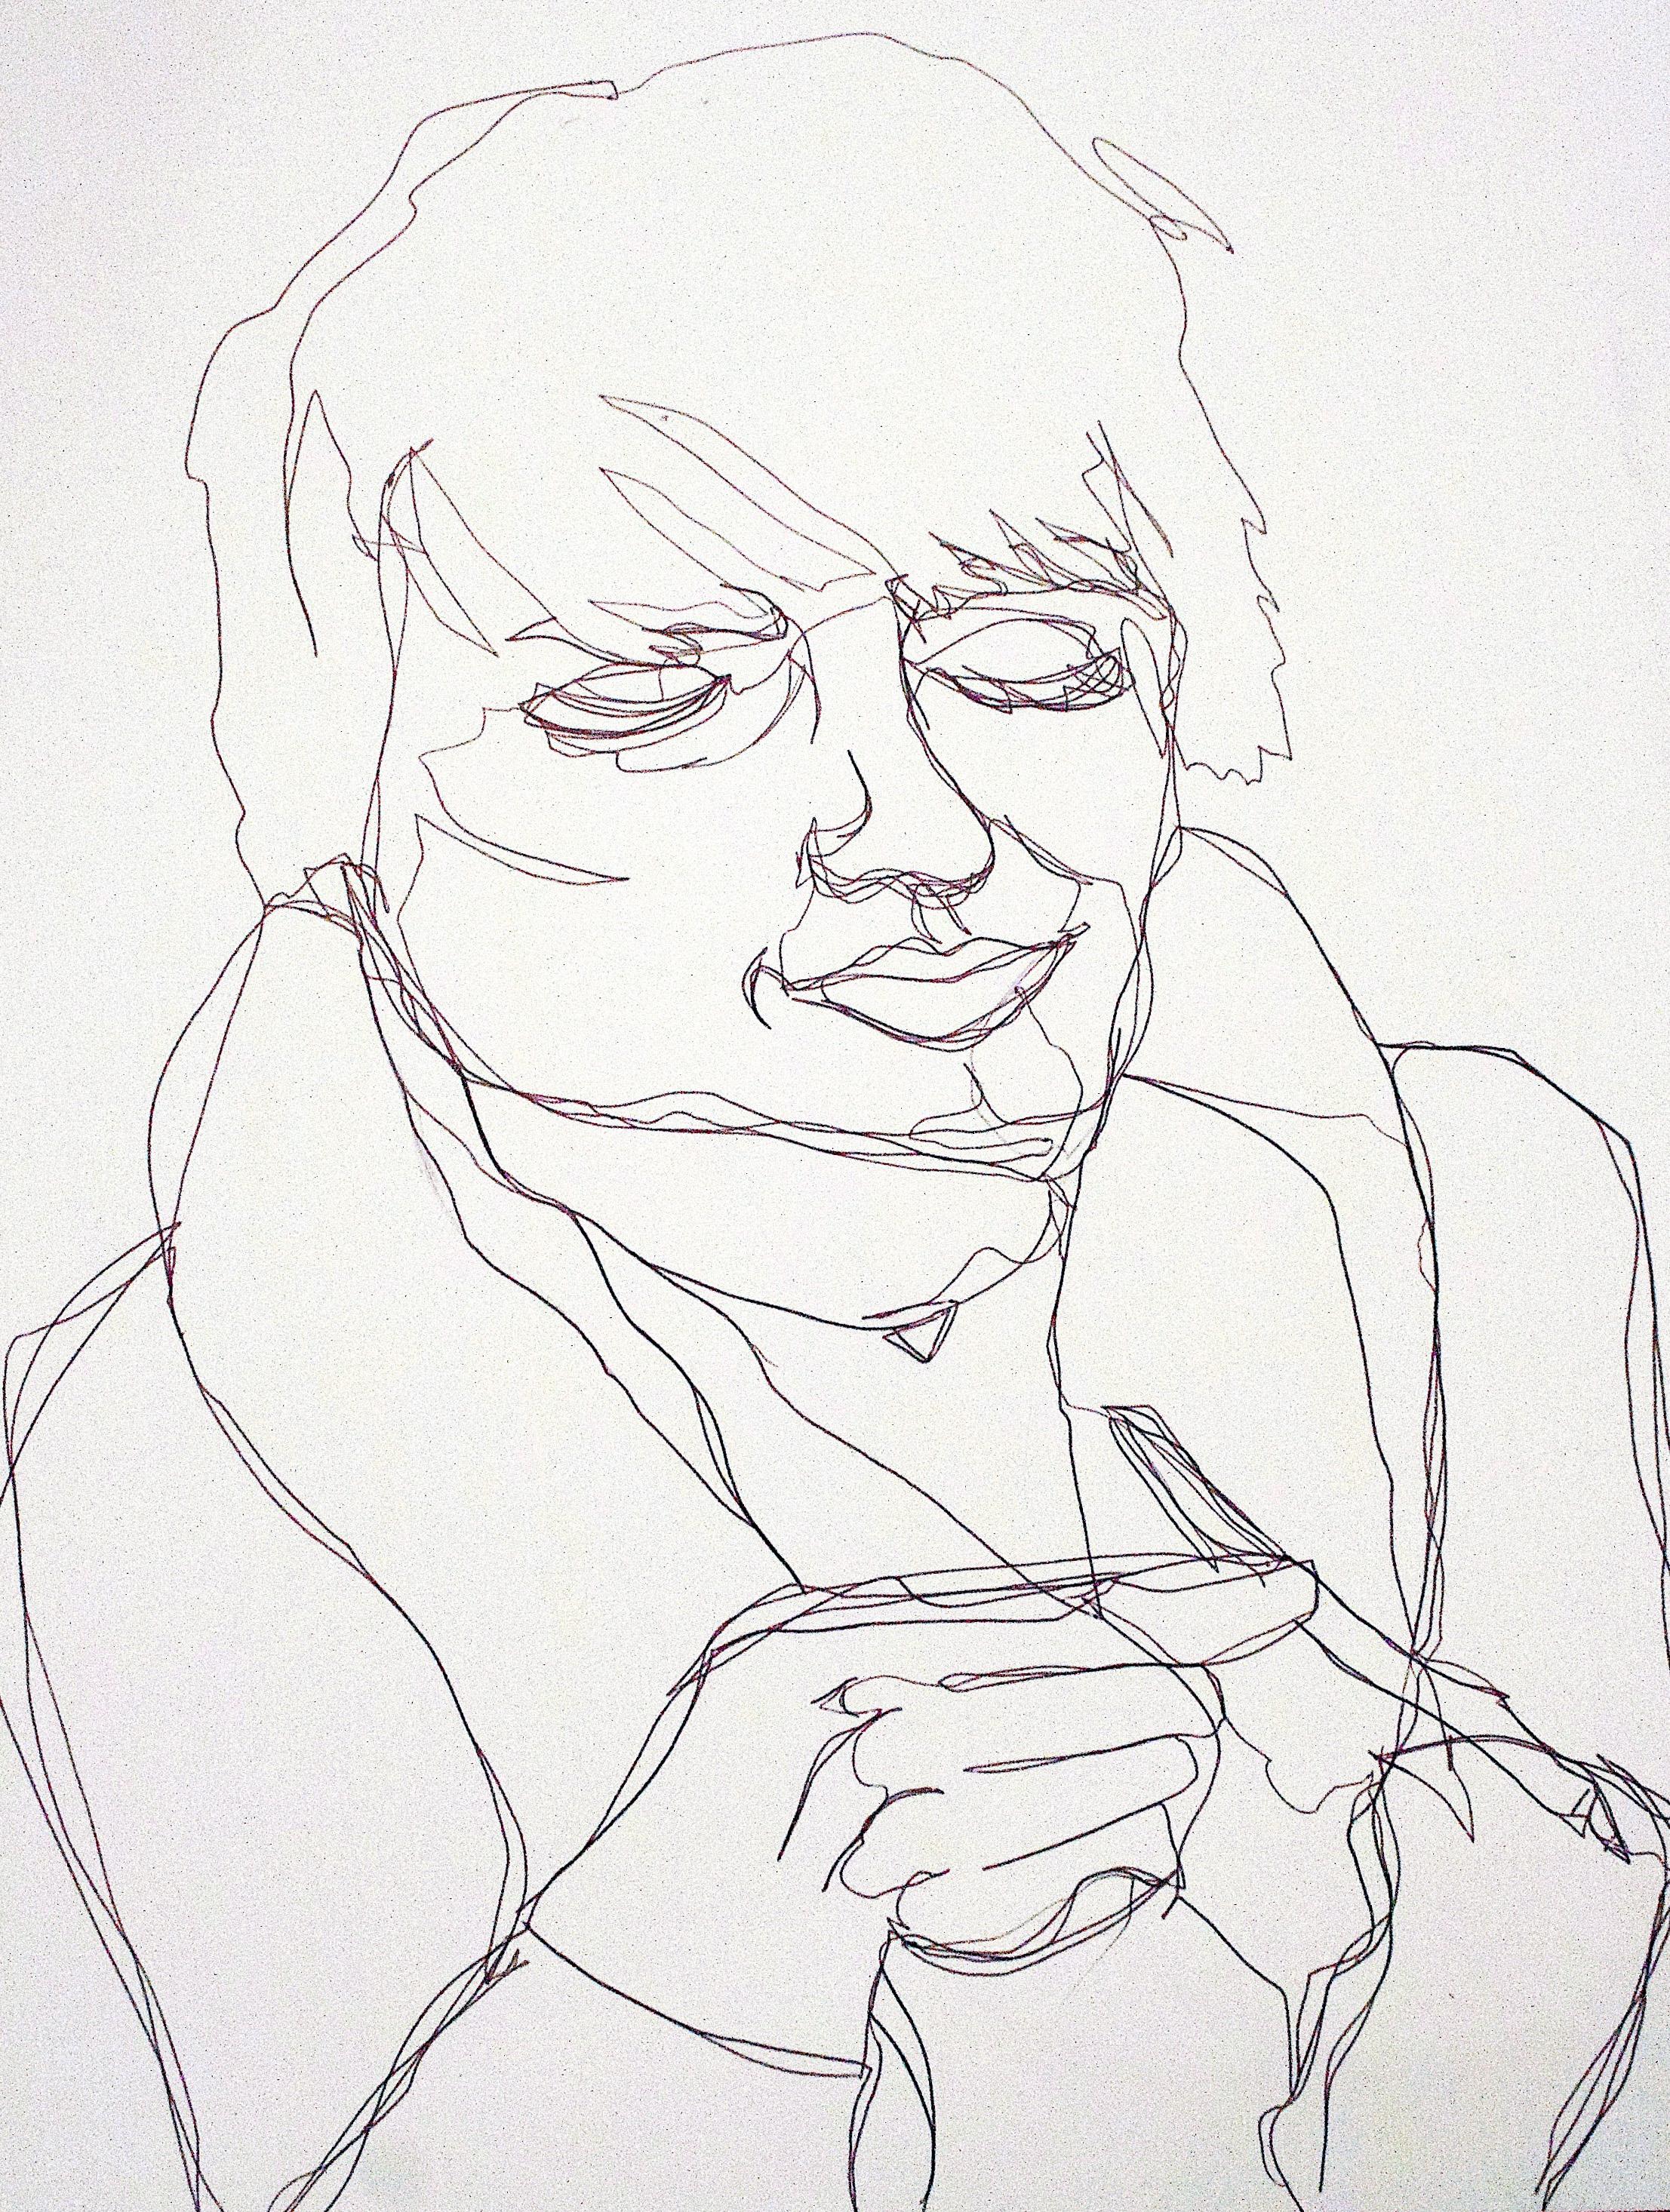 Self-Portrait 8